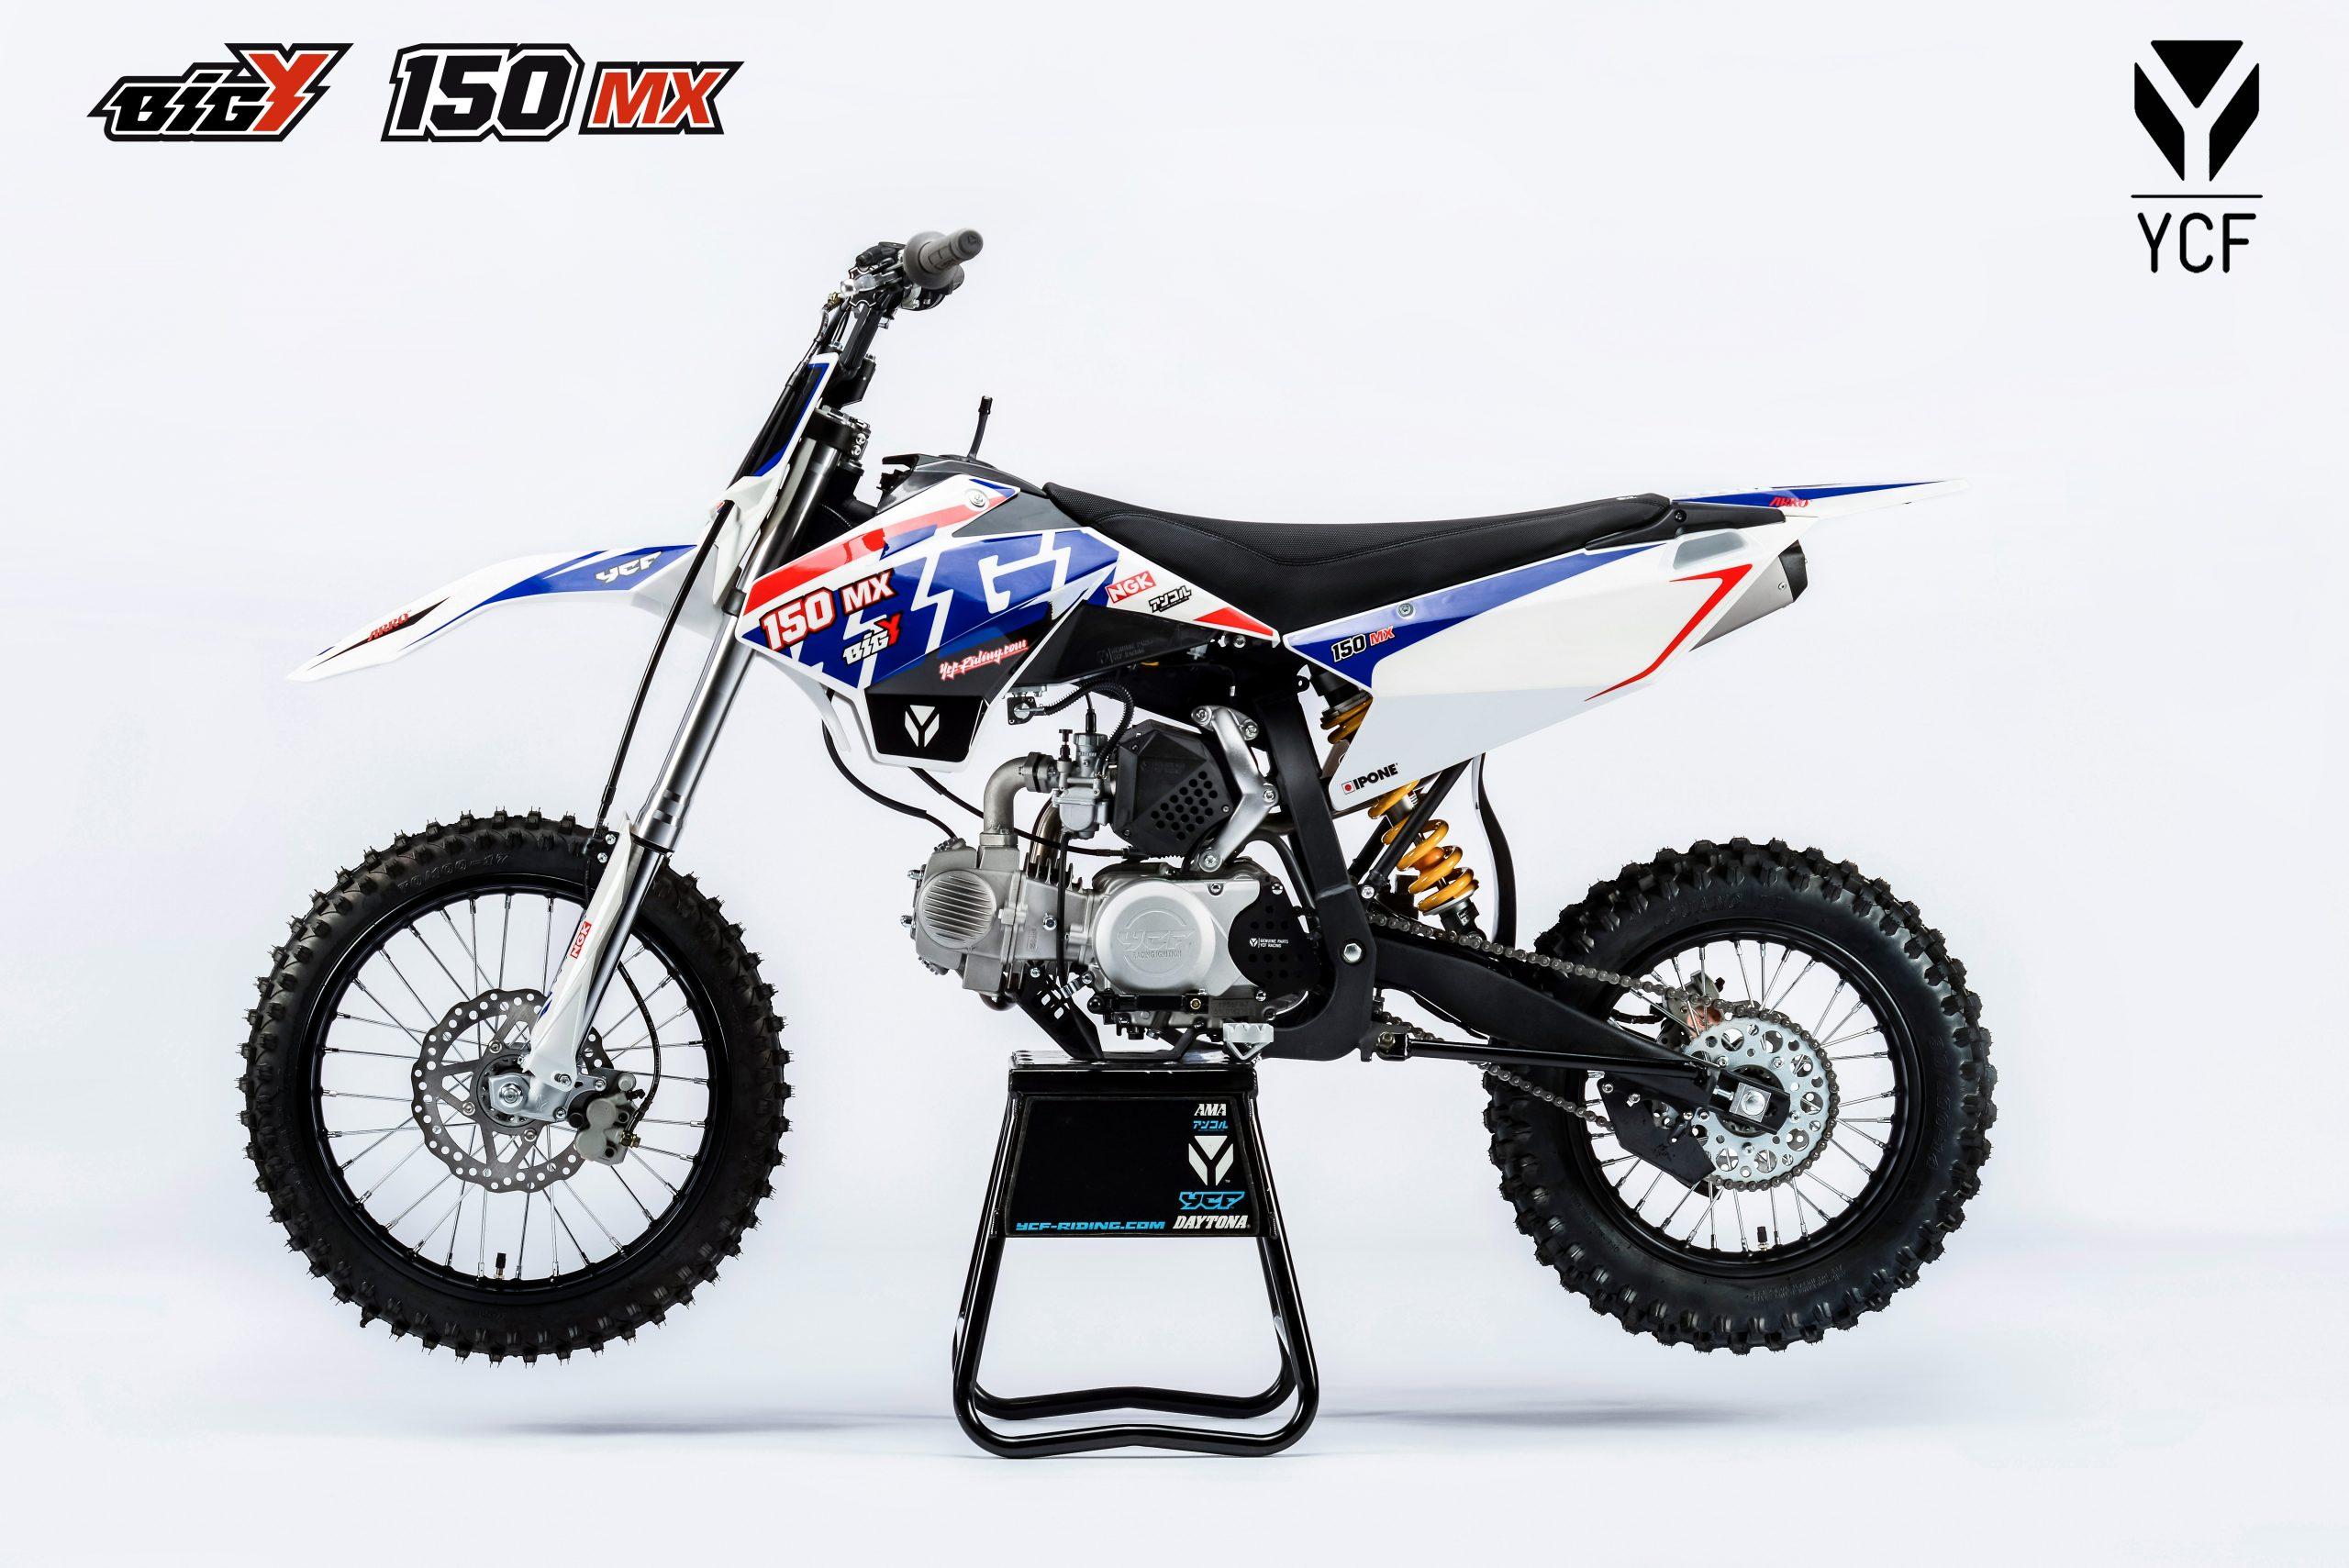 ПИТБАЙК YCF BIGY 150 EMX 2021  Артмото - купить квадроцикл в украине и харькове, мотоцикл, снегоход, скутер, мопед, электромобиль